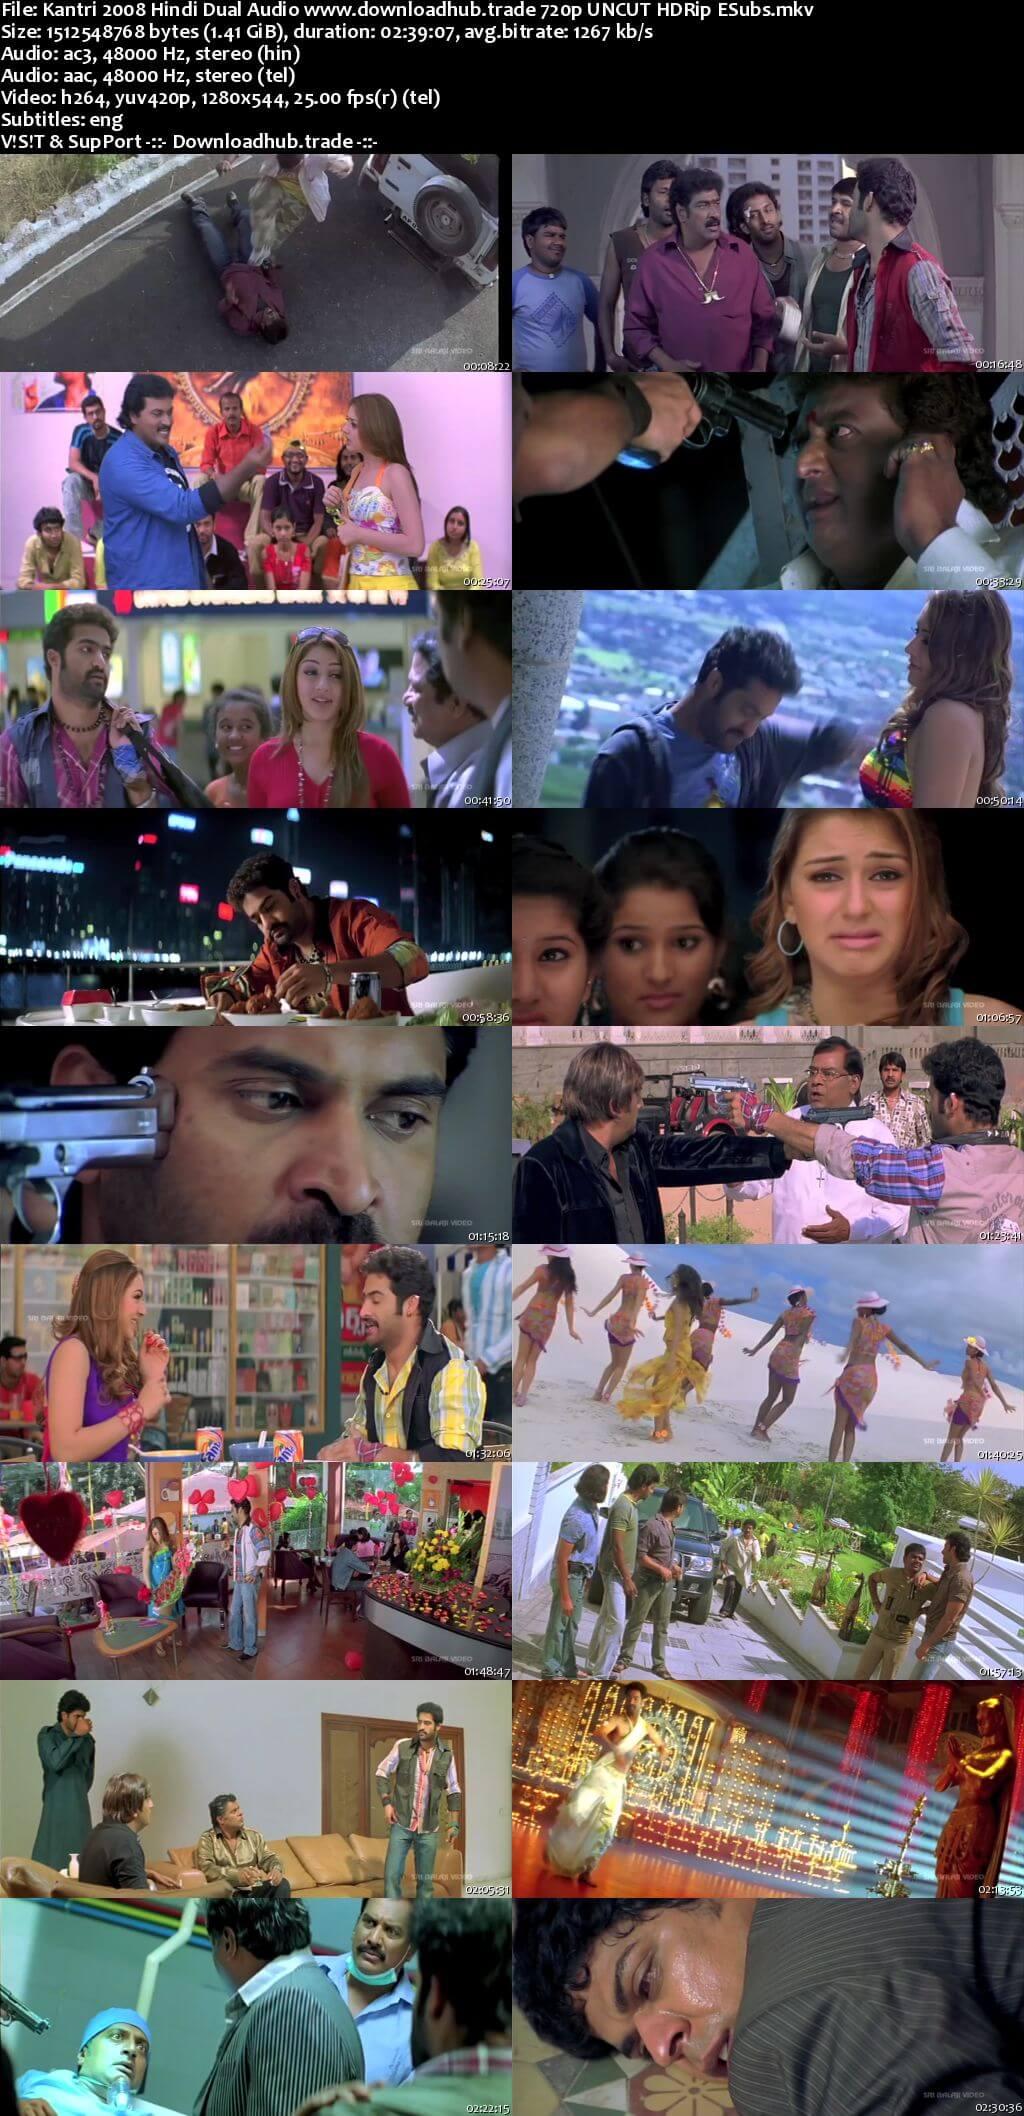 Kantri 2008 Hindi Dual Audio 720p UNCUT HDRip ESubs